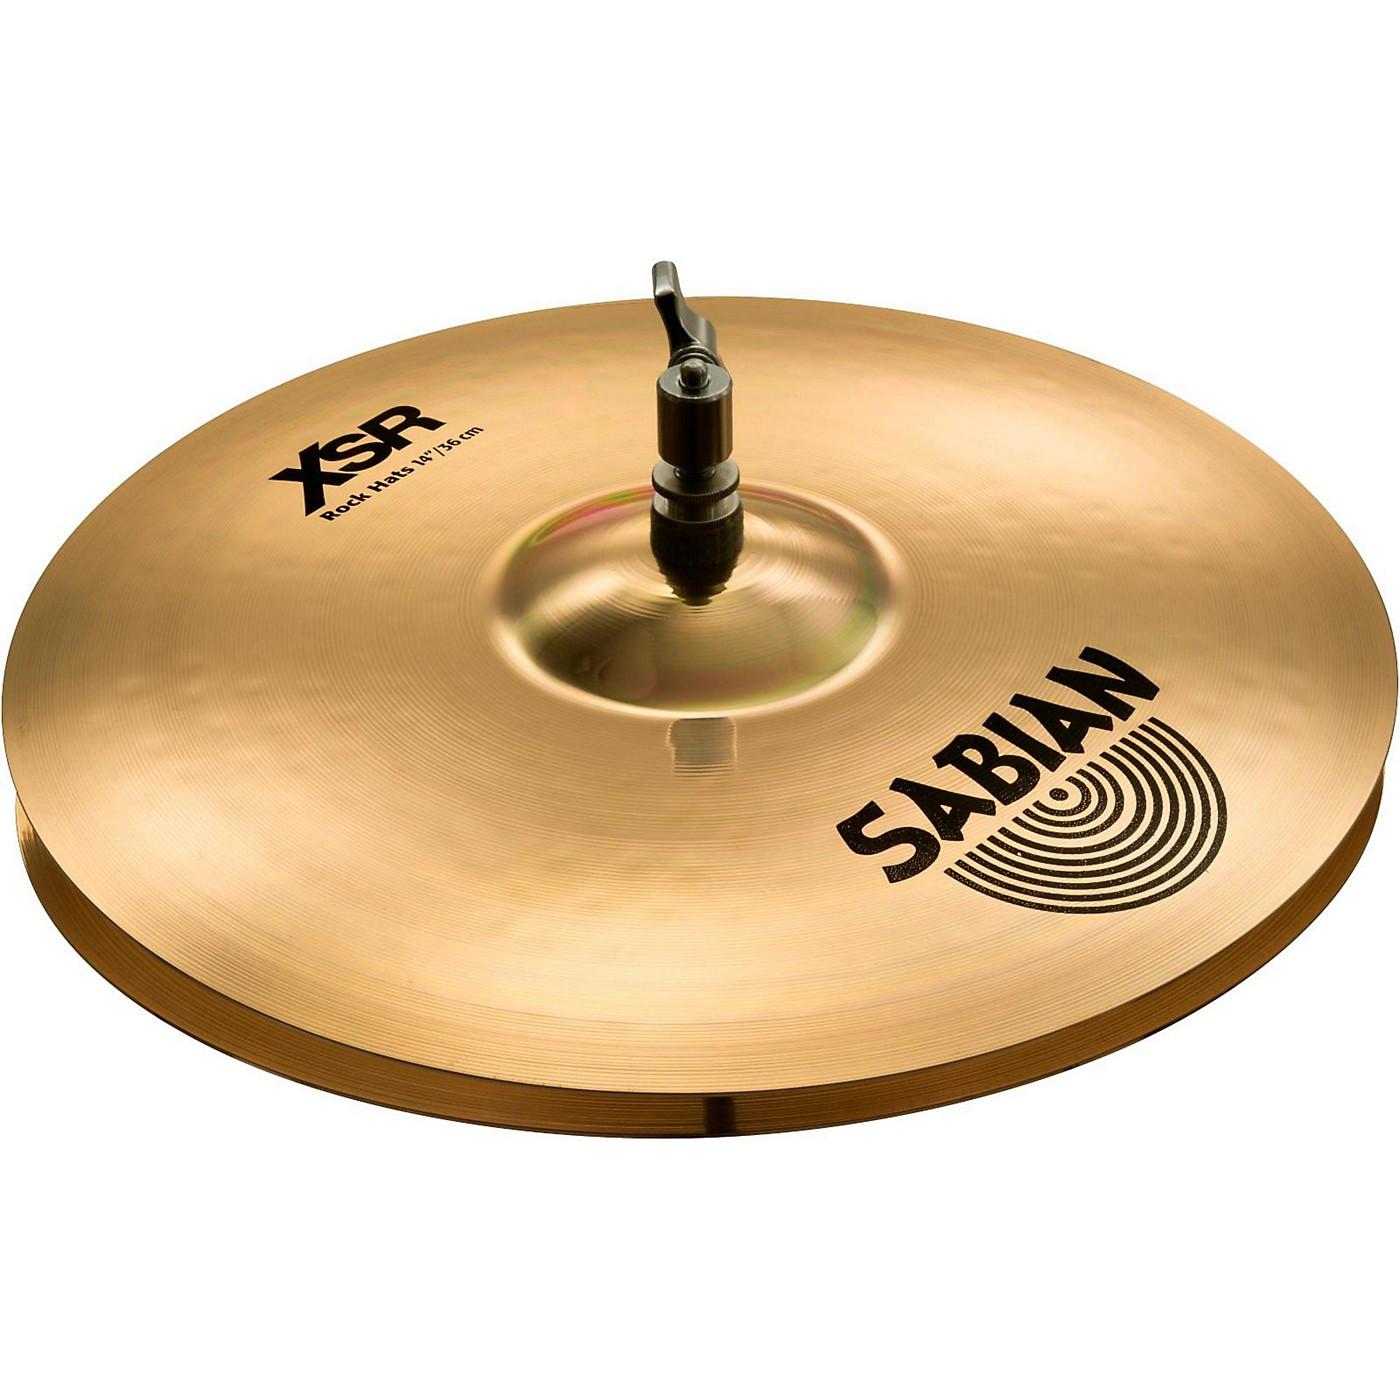 Sabian XSR Series Rock Hi-Hat Cymbal Pair thumbnail